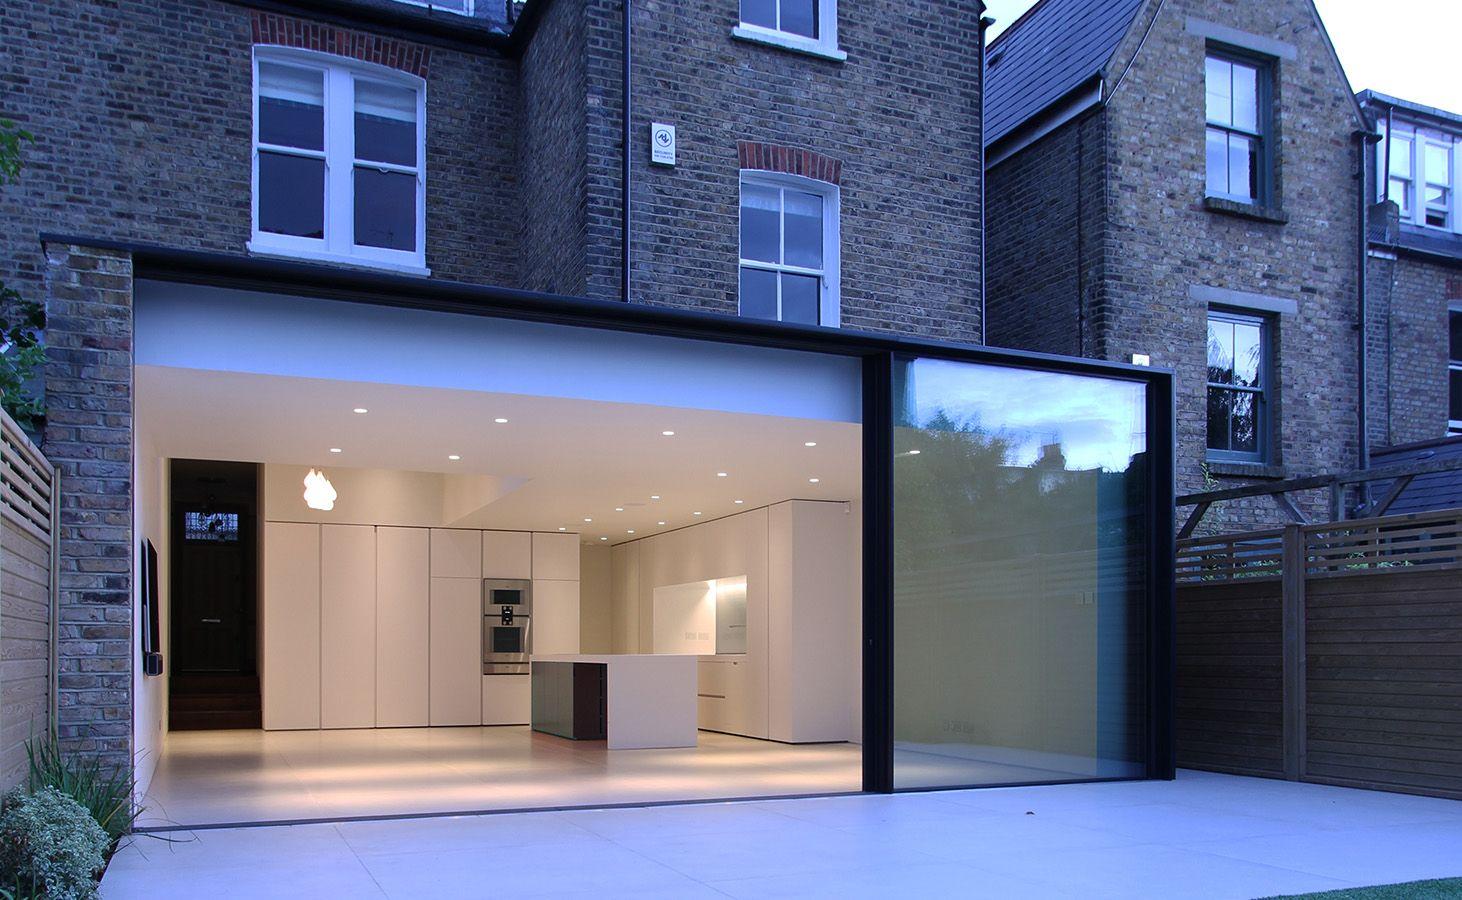 Rear Glass Extension , London, Clapham Common, Slimline Sliding doors, Panoramah, LBMVarchitects